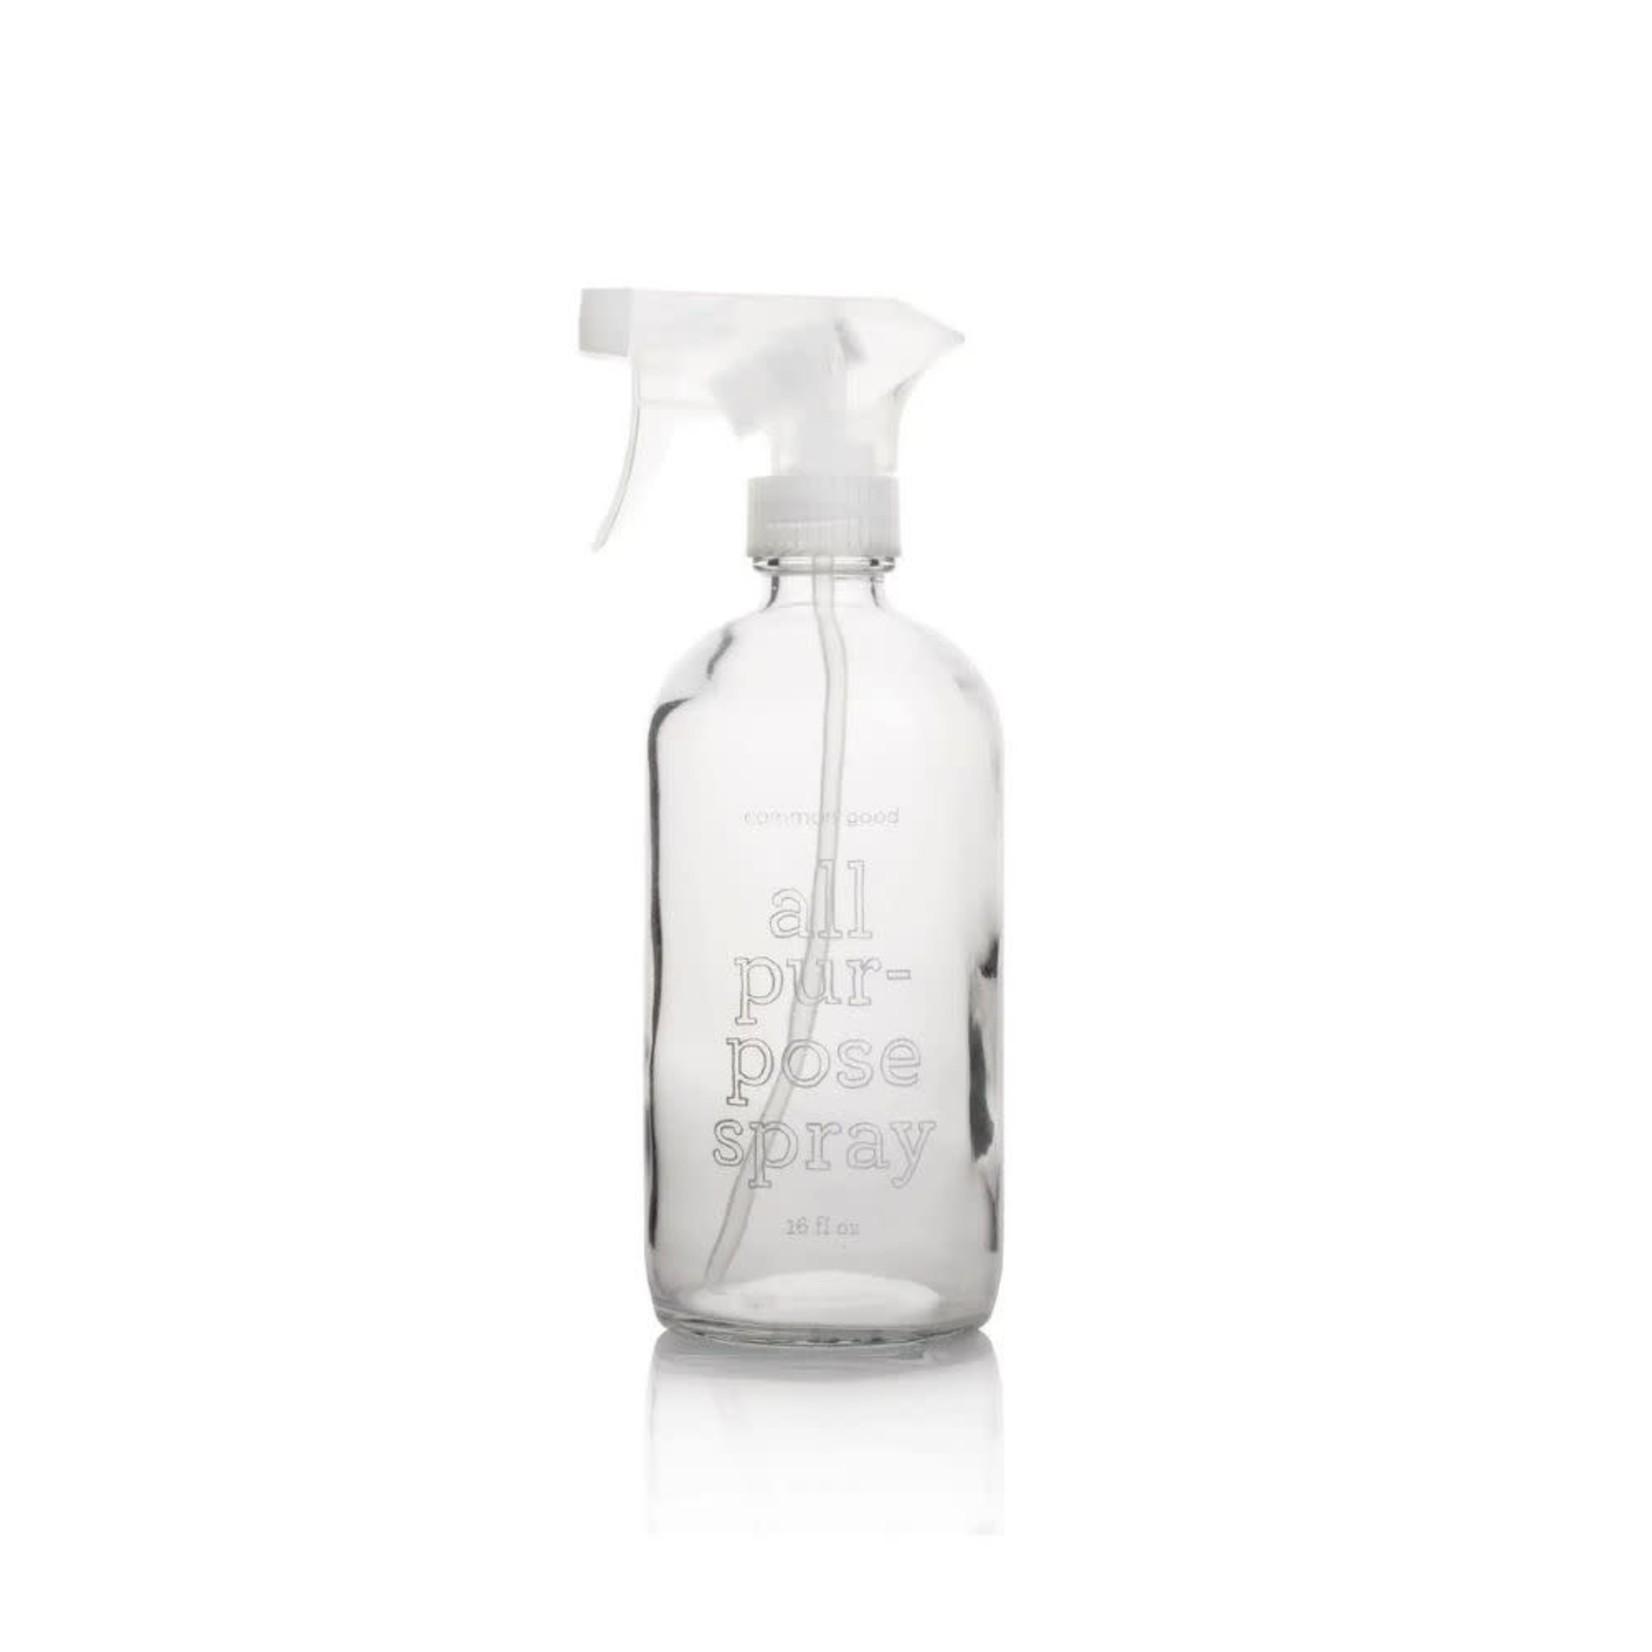 16 oz Glass Bottle, All Purpose